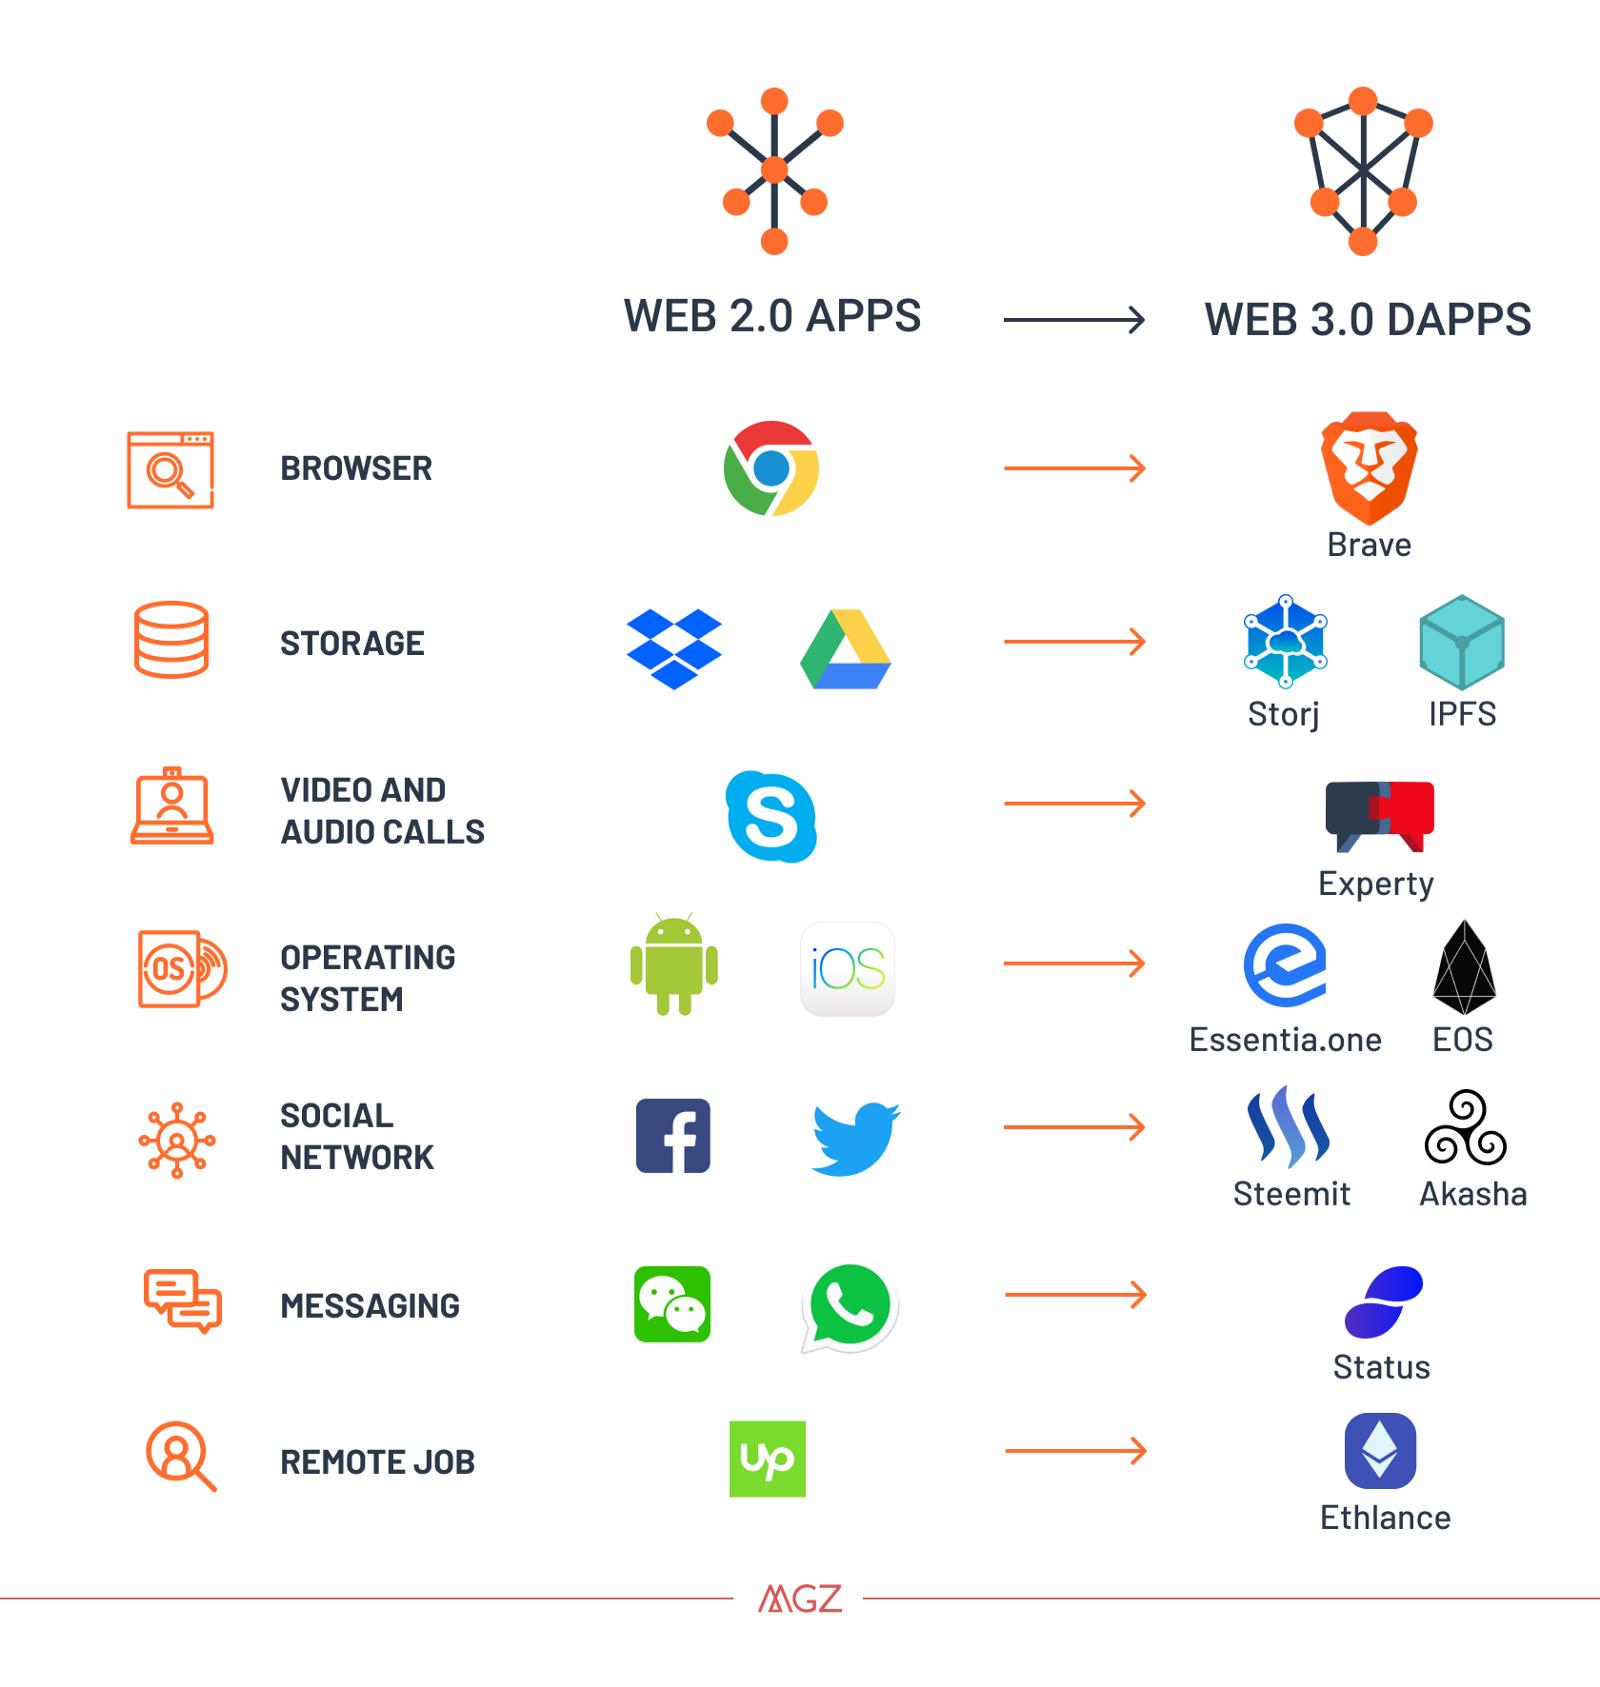 Web 2.0 > Web 3.0